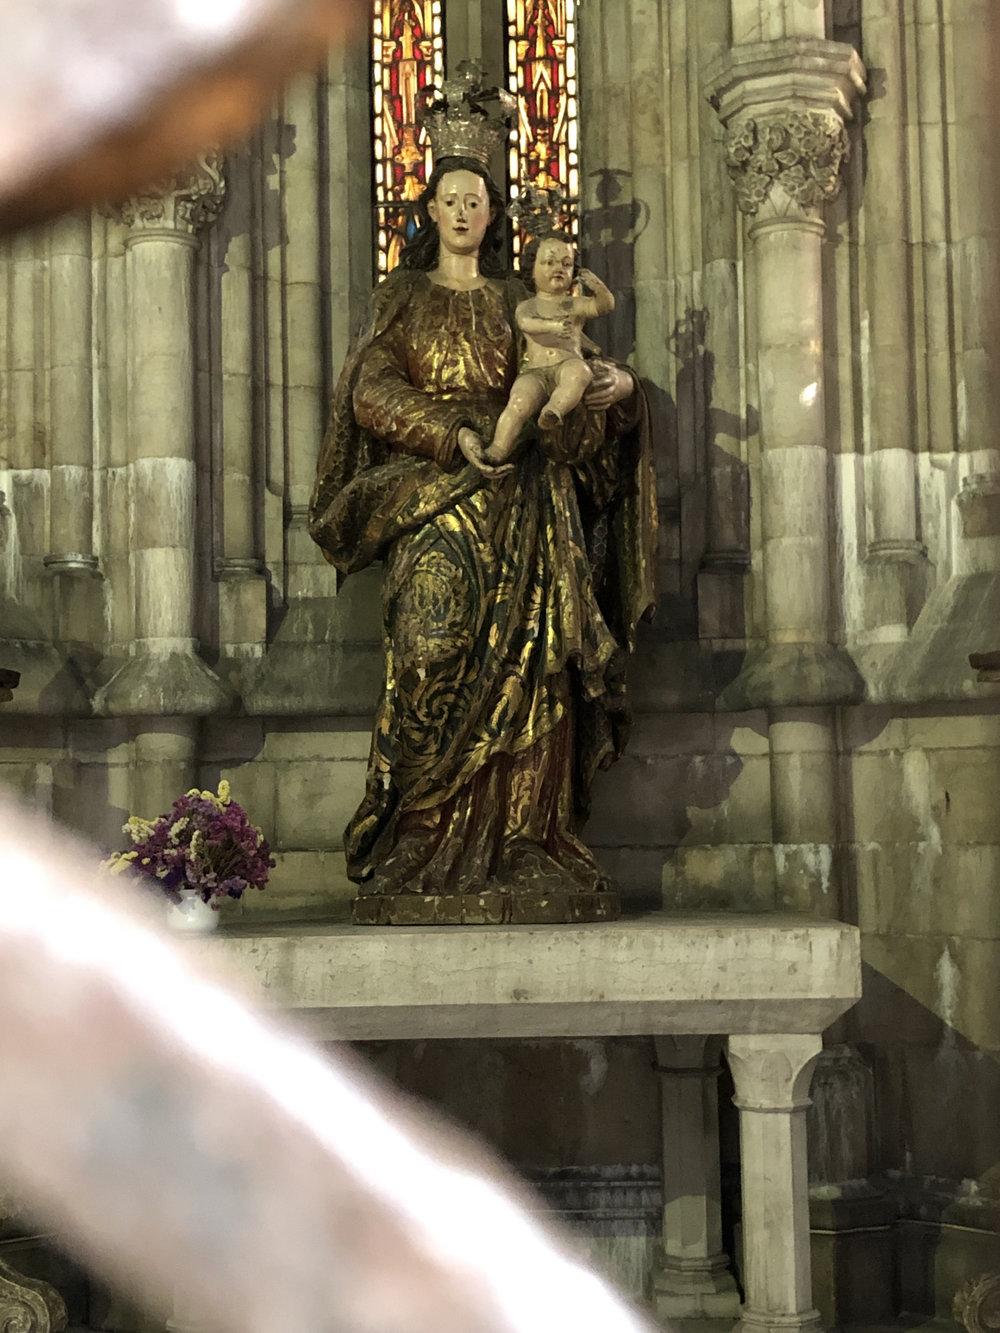 teri_lisbon_portugal_cathedral_spiritedtable_photo13.jpg